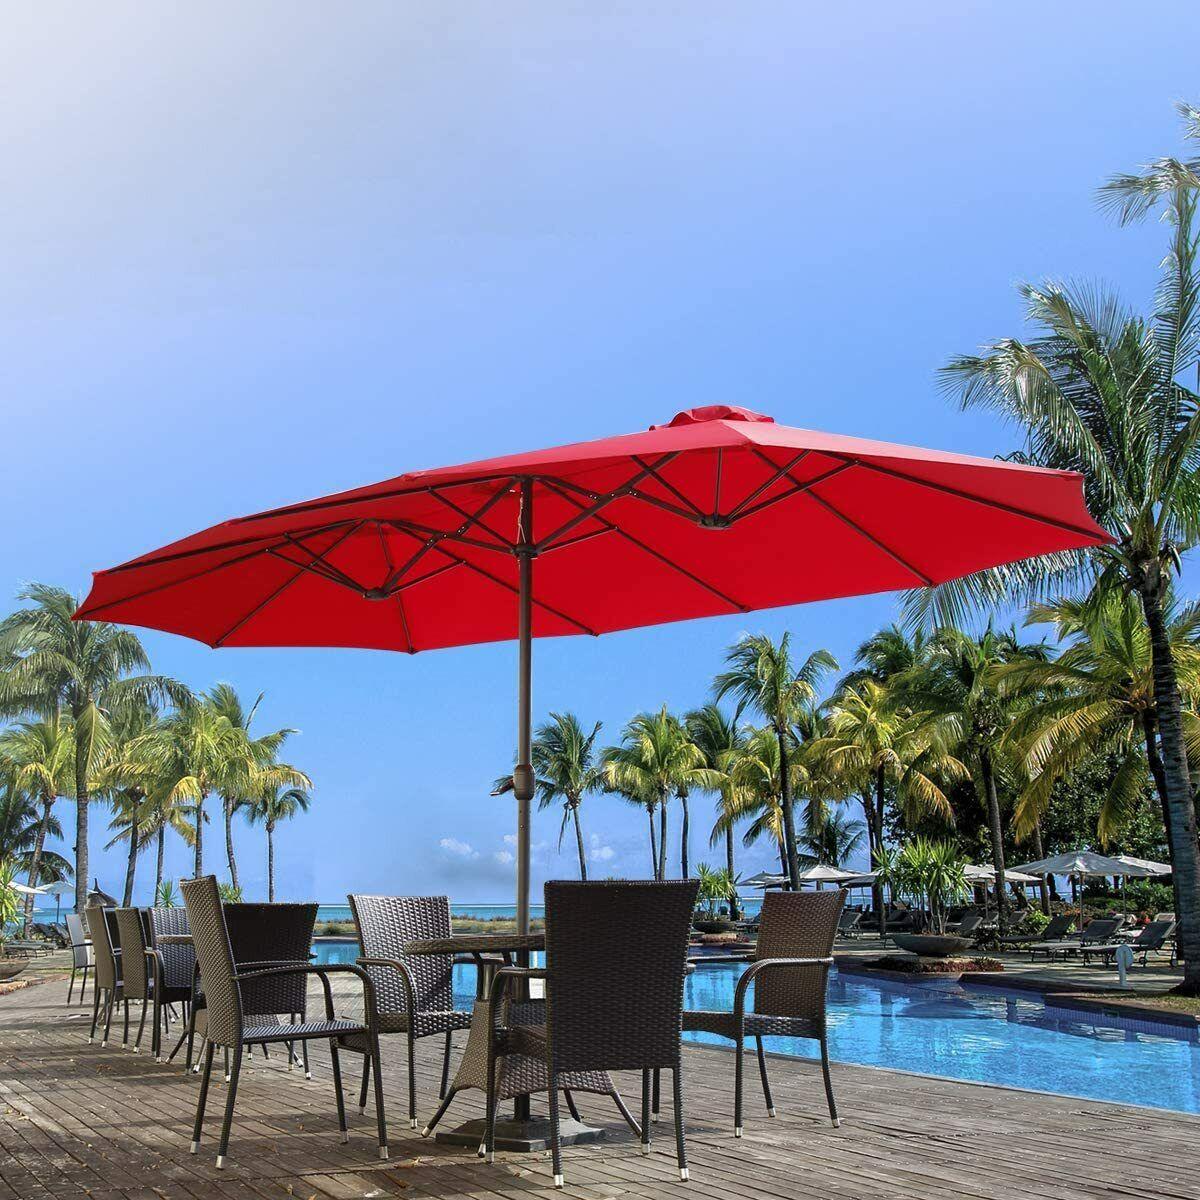 15 FT Double-Sided Patio Outdoor Umbrella Market Garden Yard Deck Pool Sunshade Garden Structures & Shade